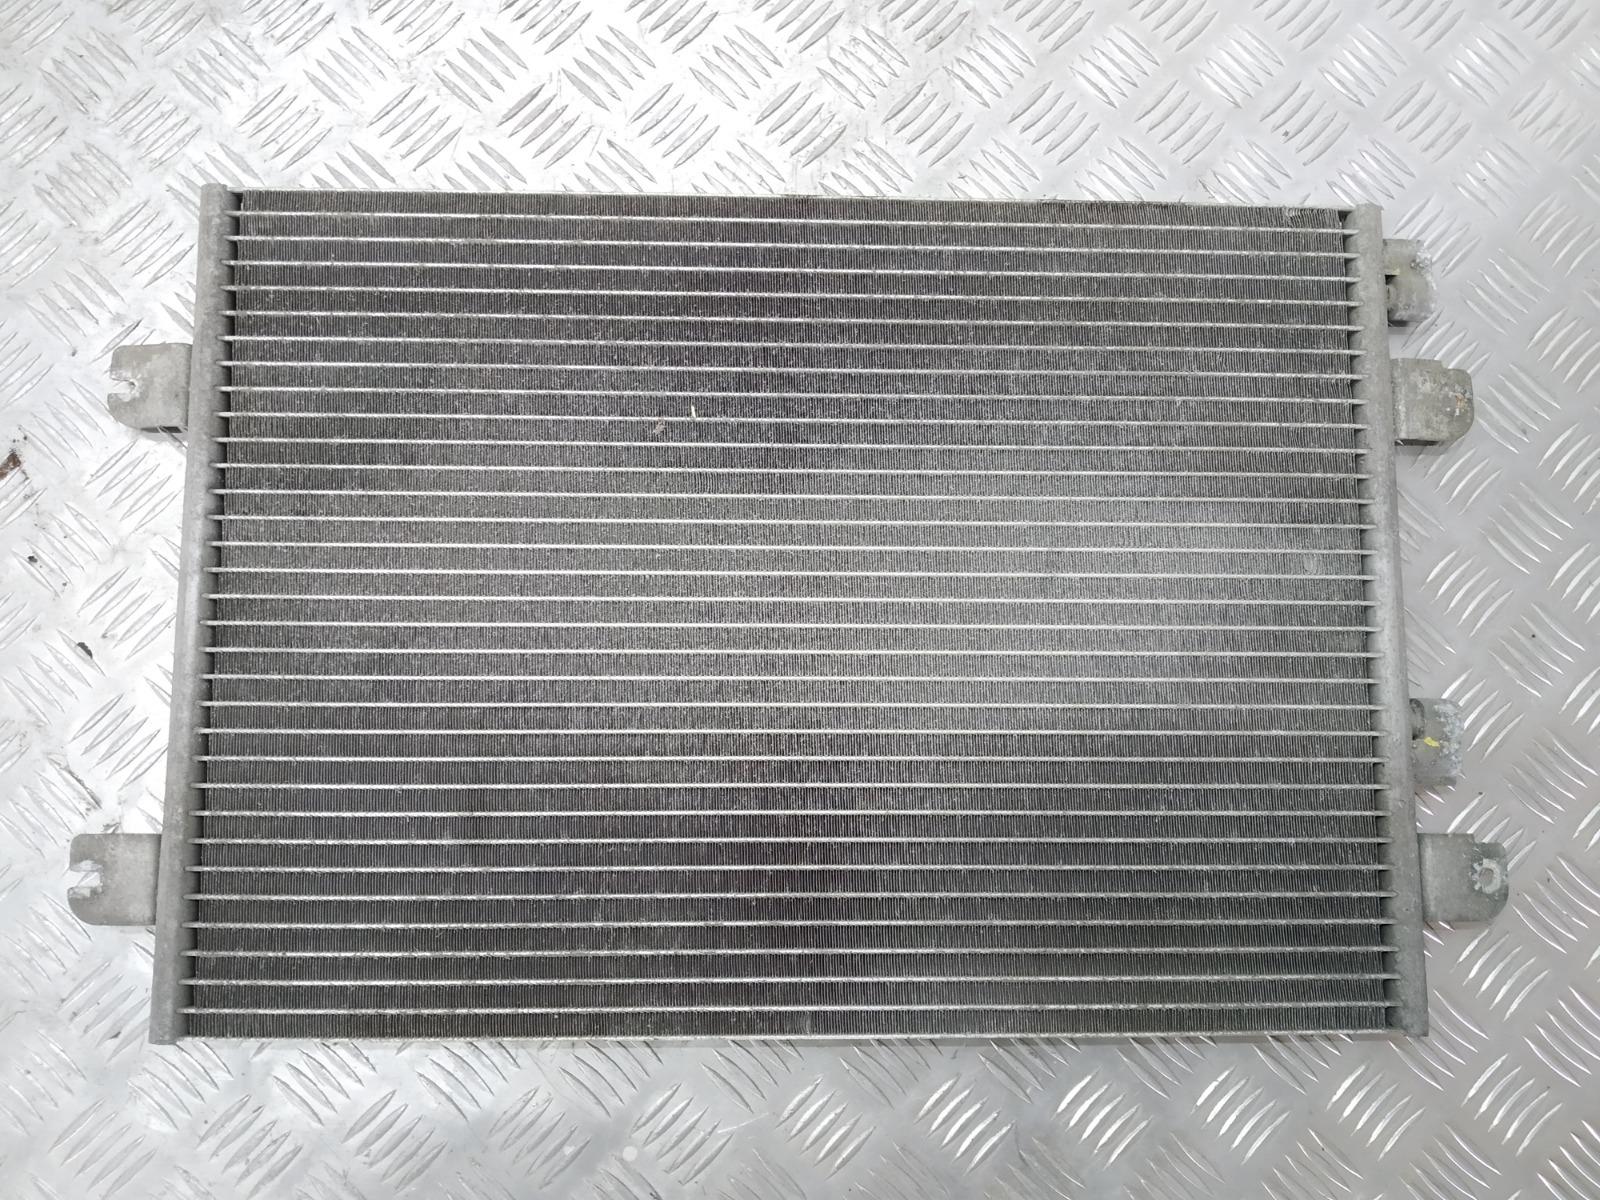 Радиатор кондиционера Volkswagen Sharan 1.9 TDI 2002 (б/у)